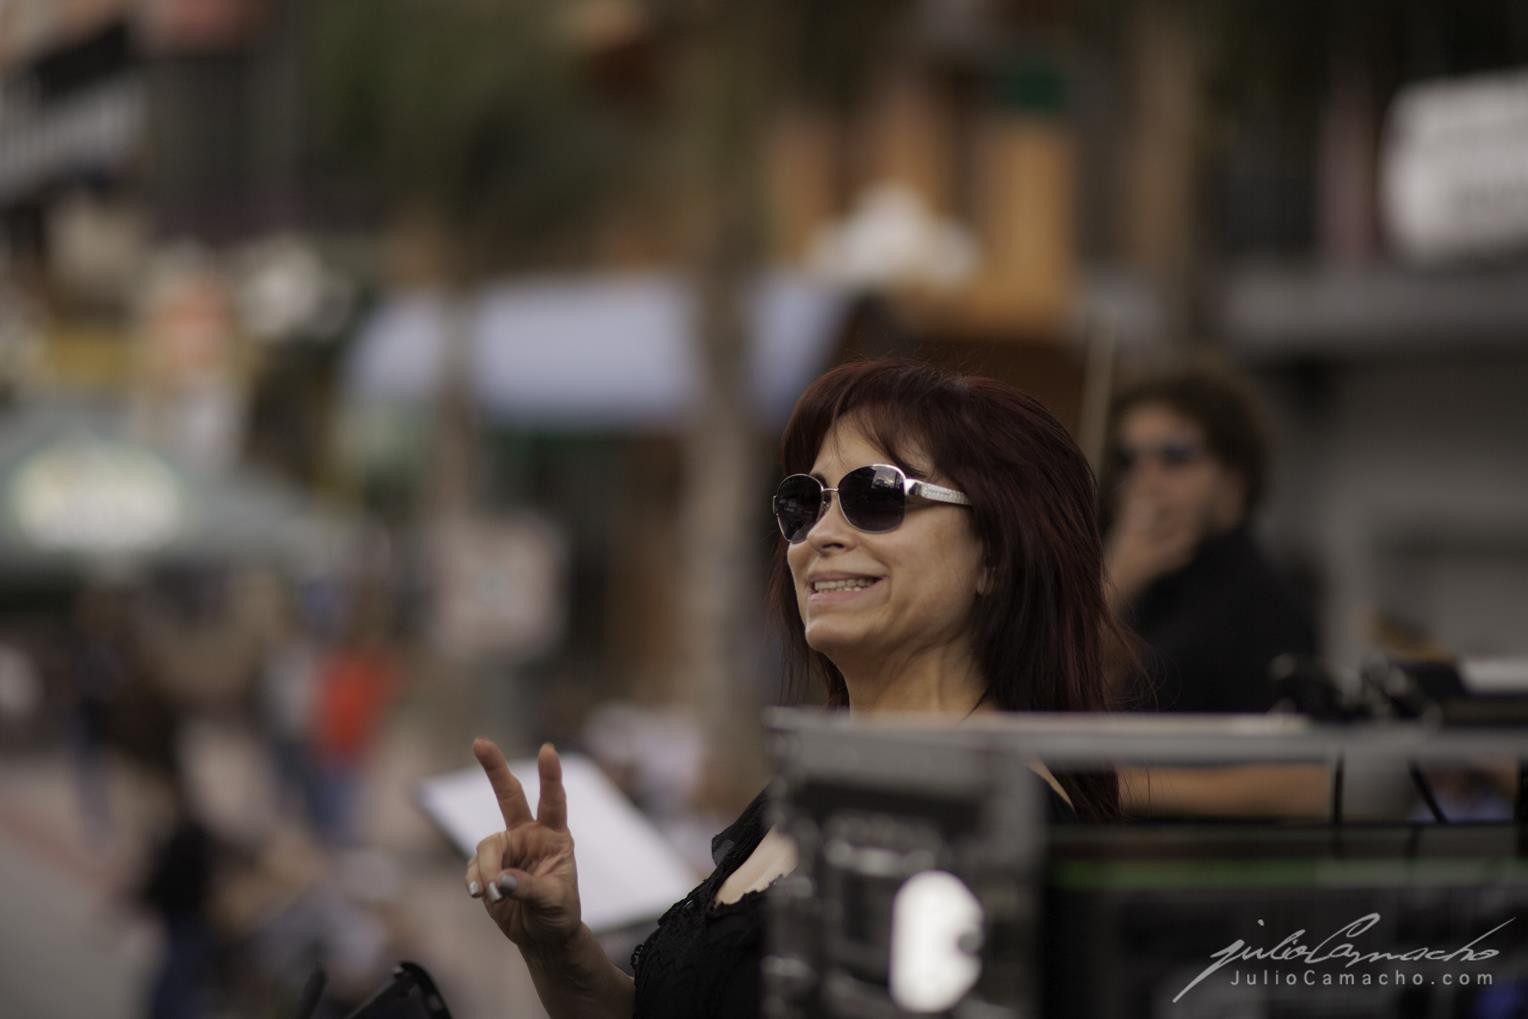 2014-10-30 31 CAST TOUR Ensenada y Tijuana - 1014 - www.Juli (Copy).jpg